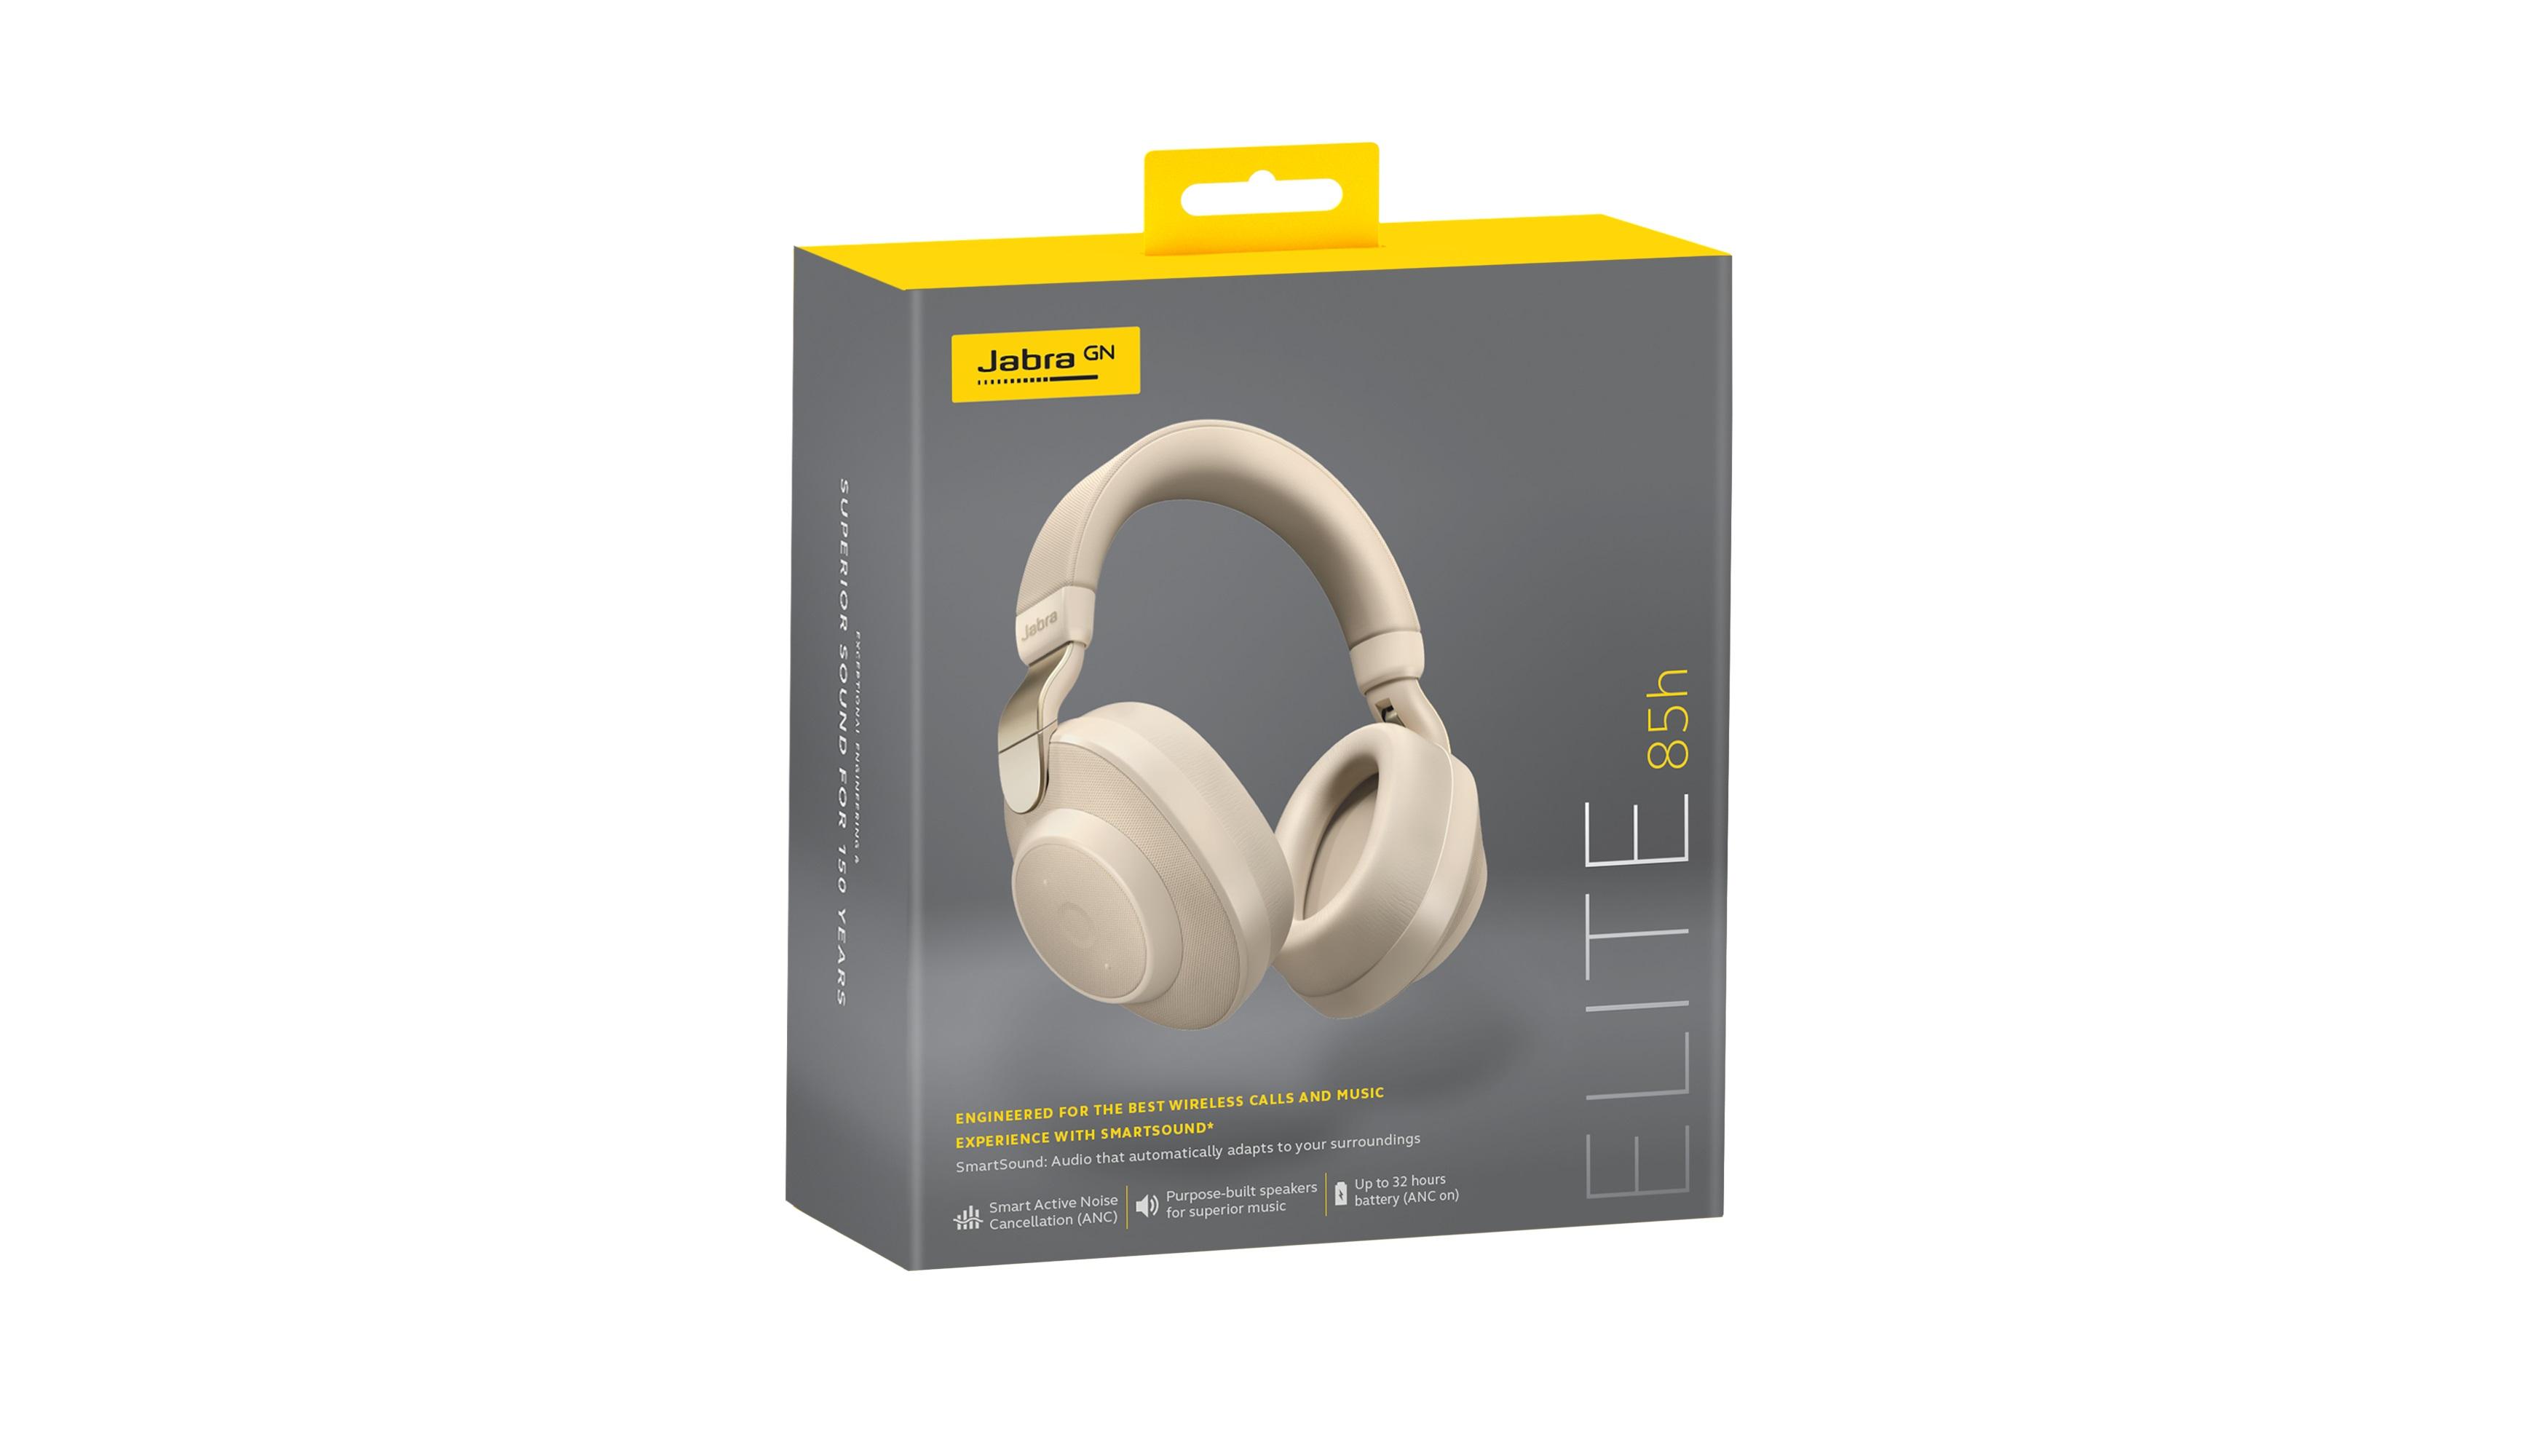 Jabra-Elite-85h-Wireless-Stereo-ANC-Headphones thumbnail 10